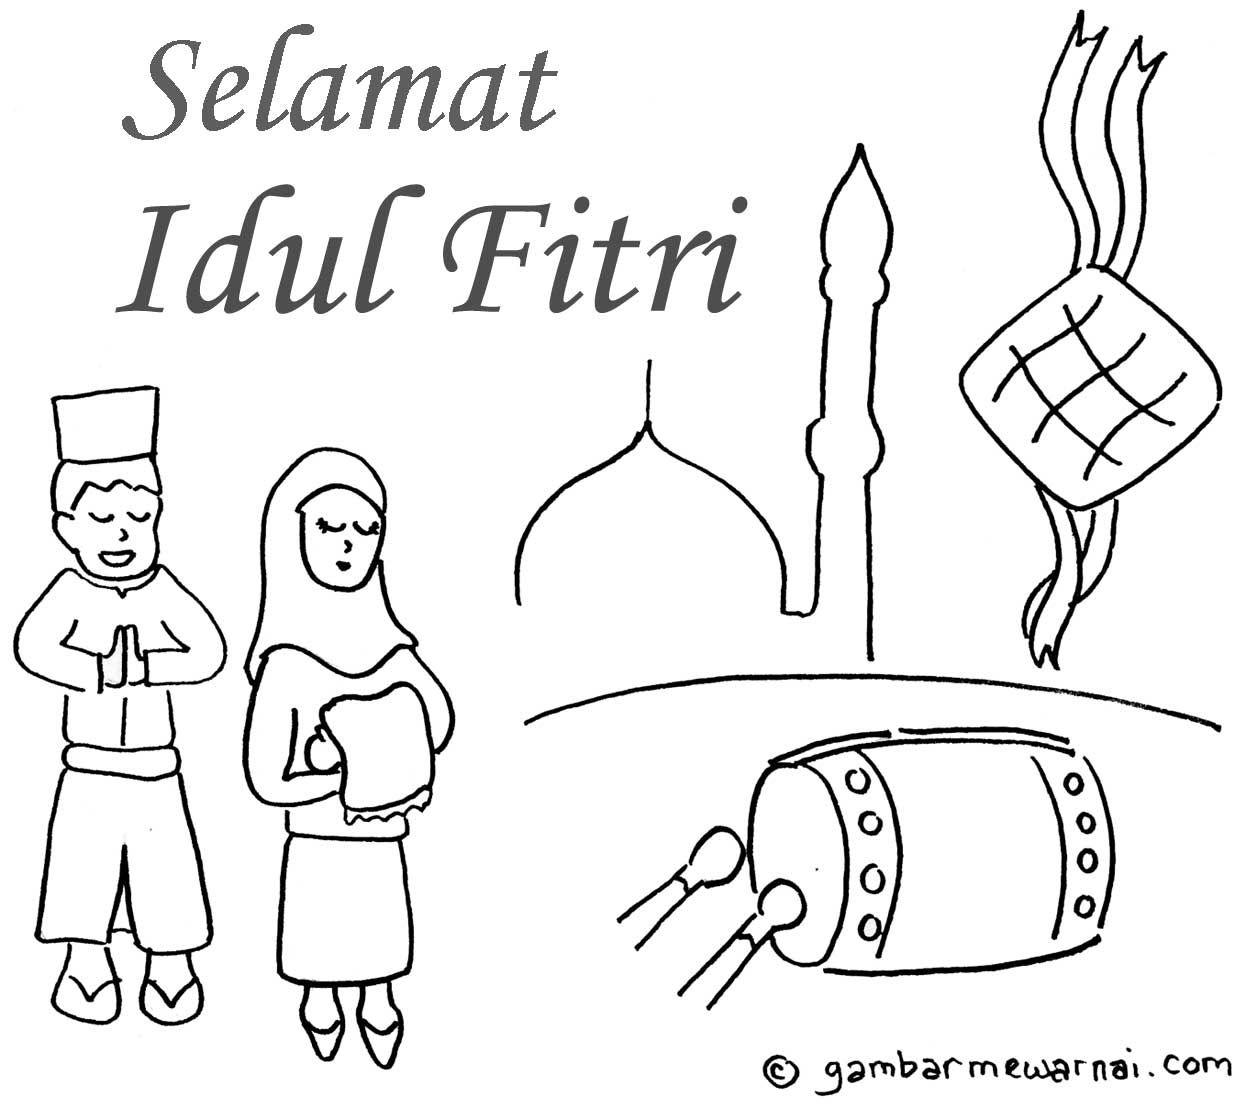 Contoh Gambar Mewarnai Gambar Idul Fitri